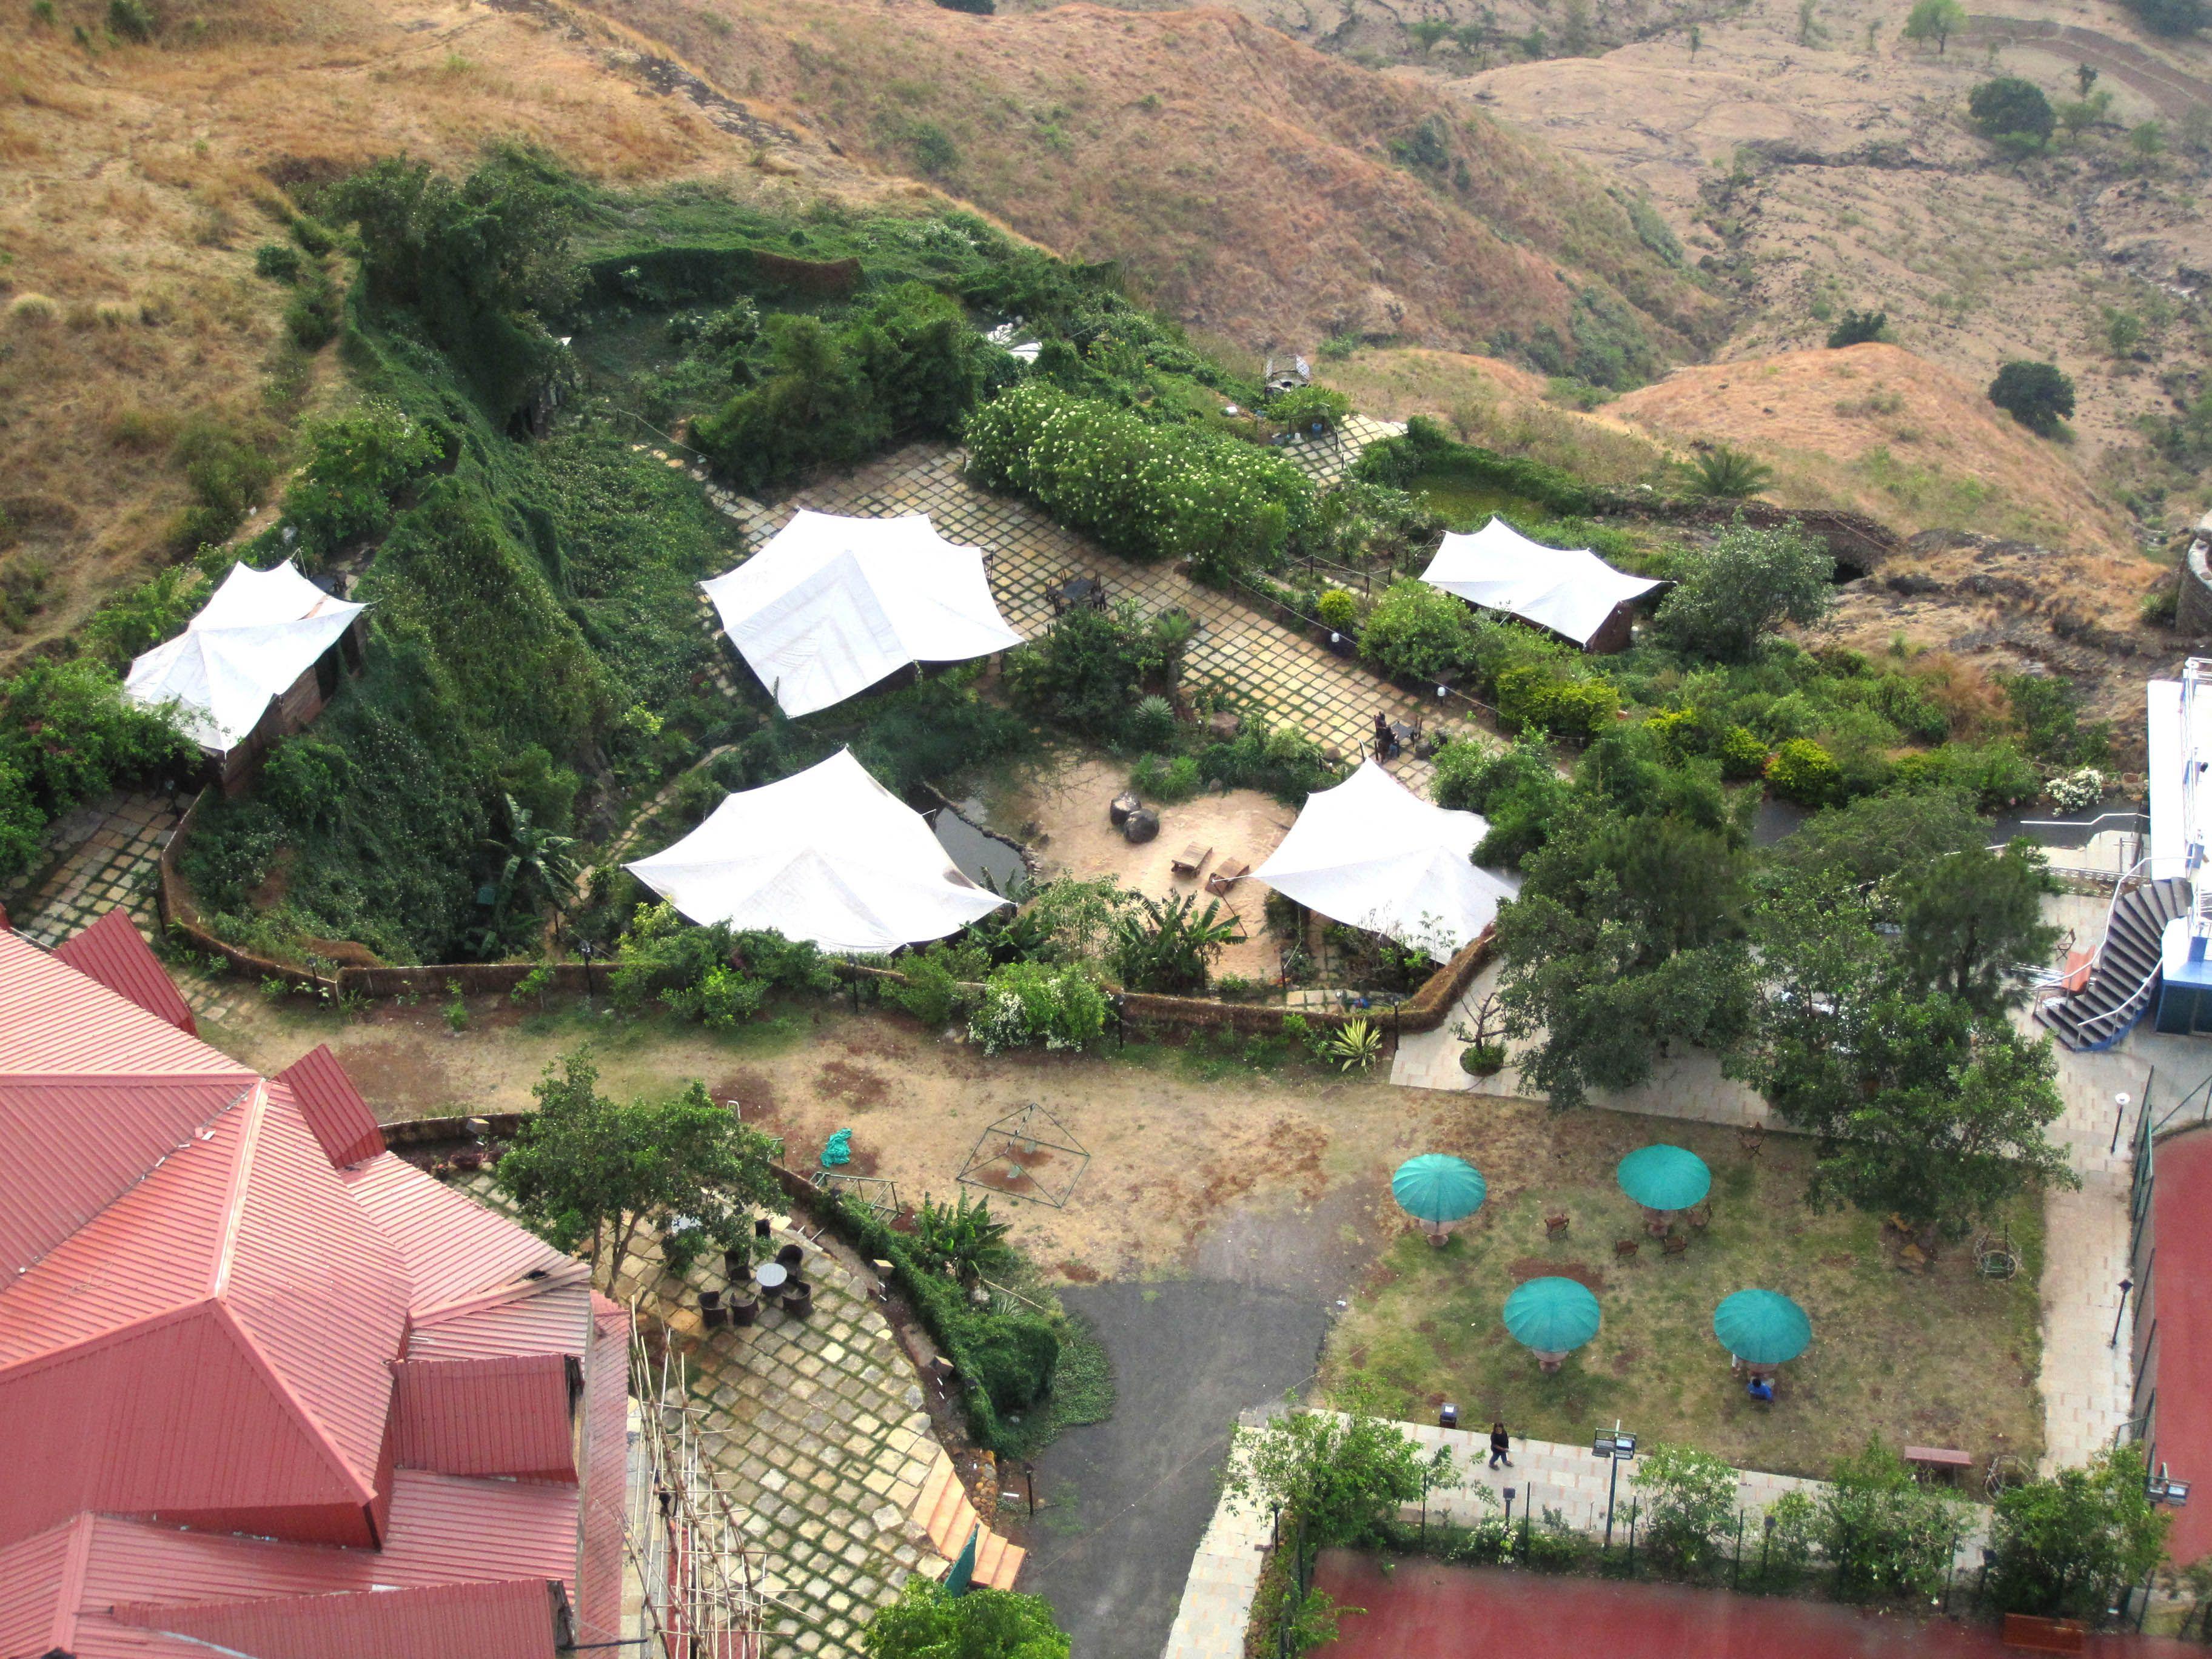 Camping Resorts in Mahabaleshwar Panchagni near Mumbai ...